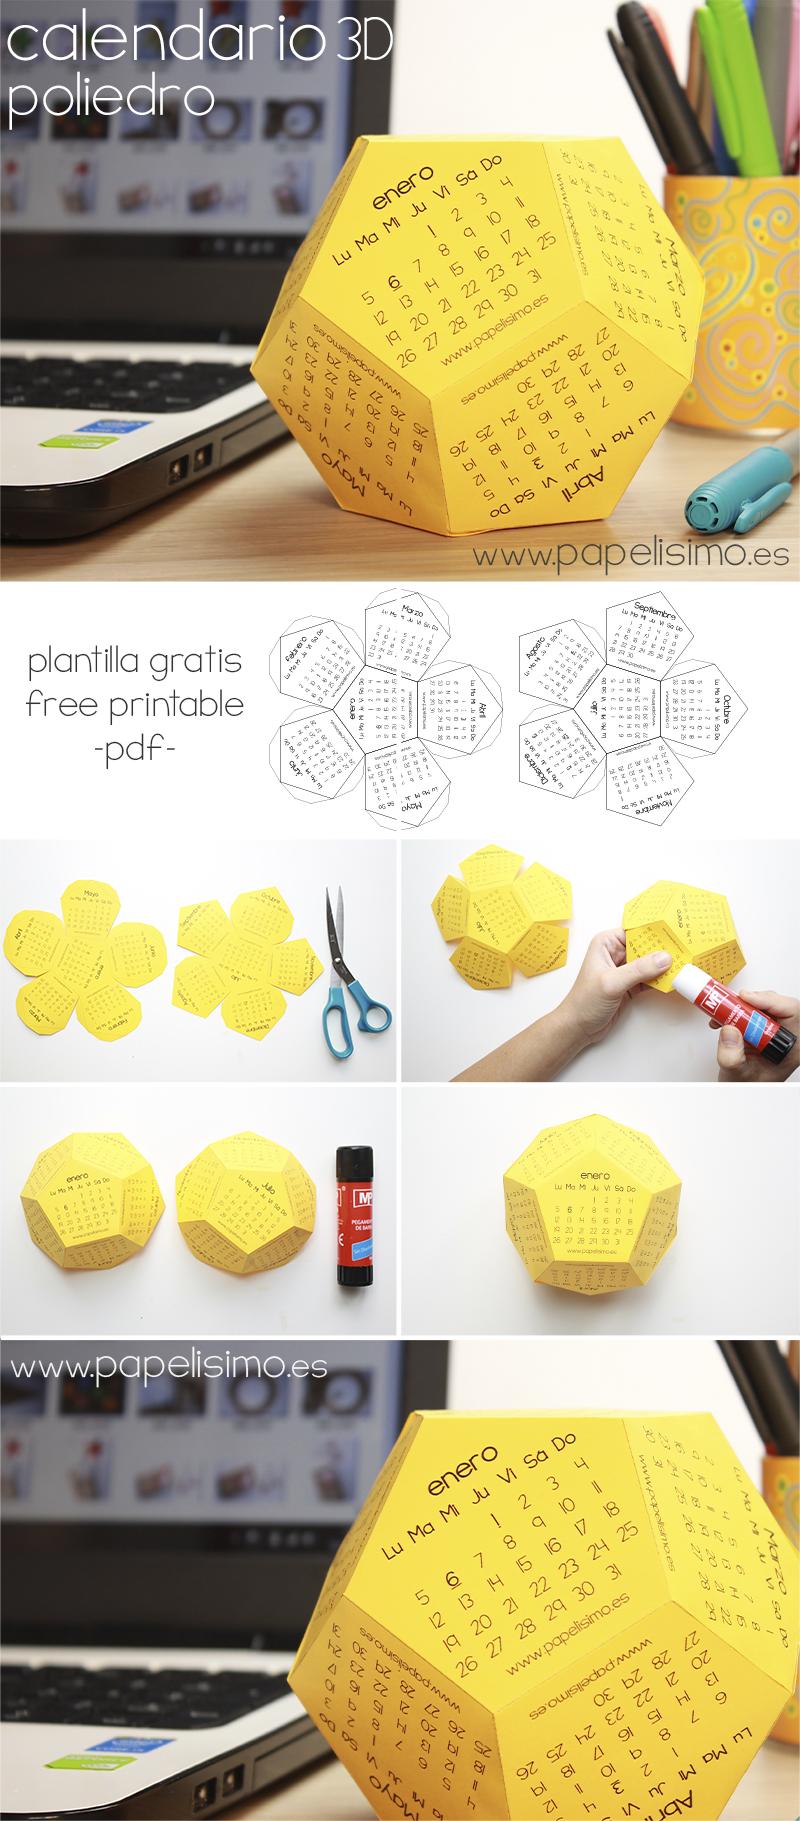 Calendario 2015 3D (pdf gratis para imprimir) | Cosas interesantes ...